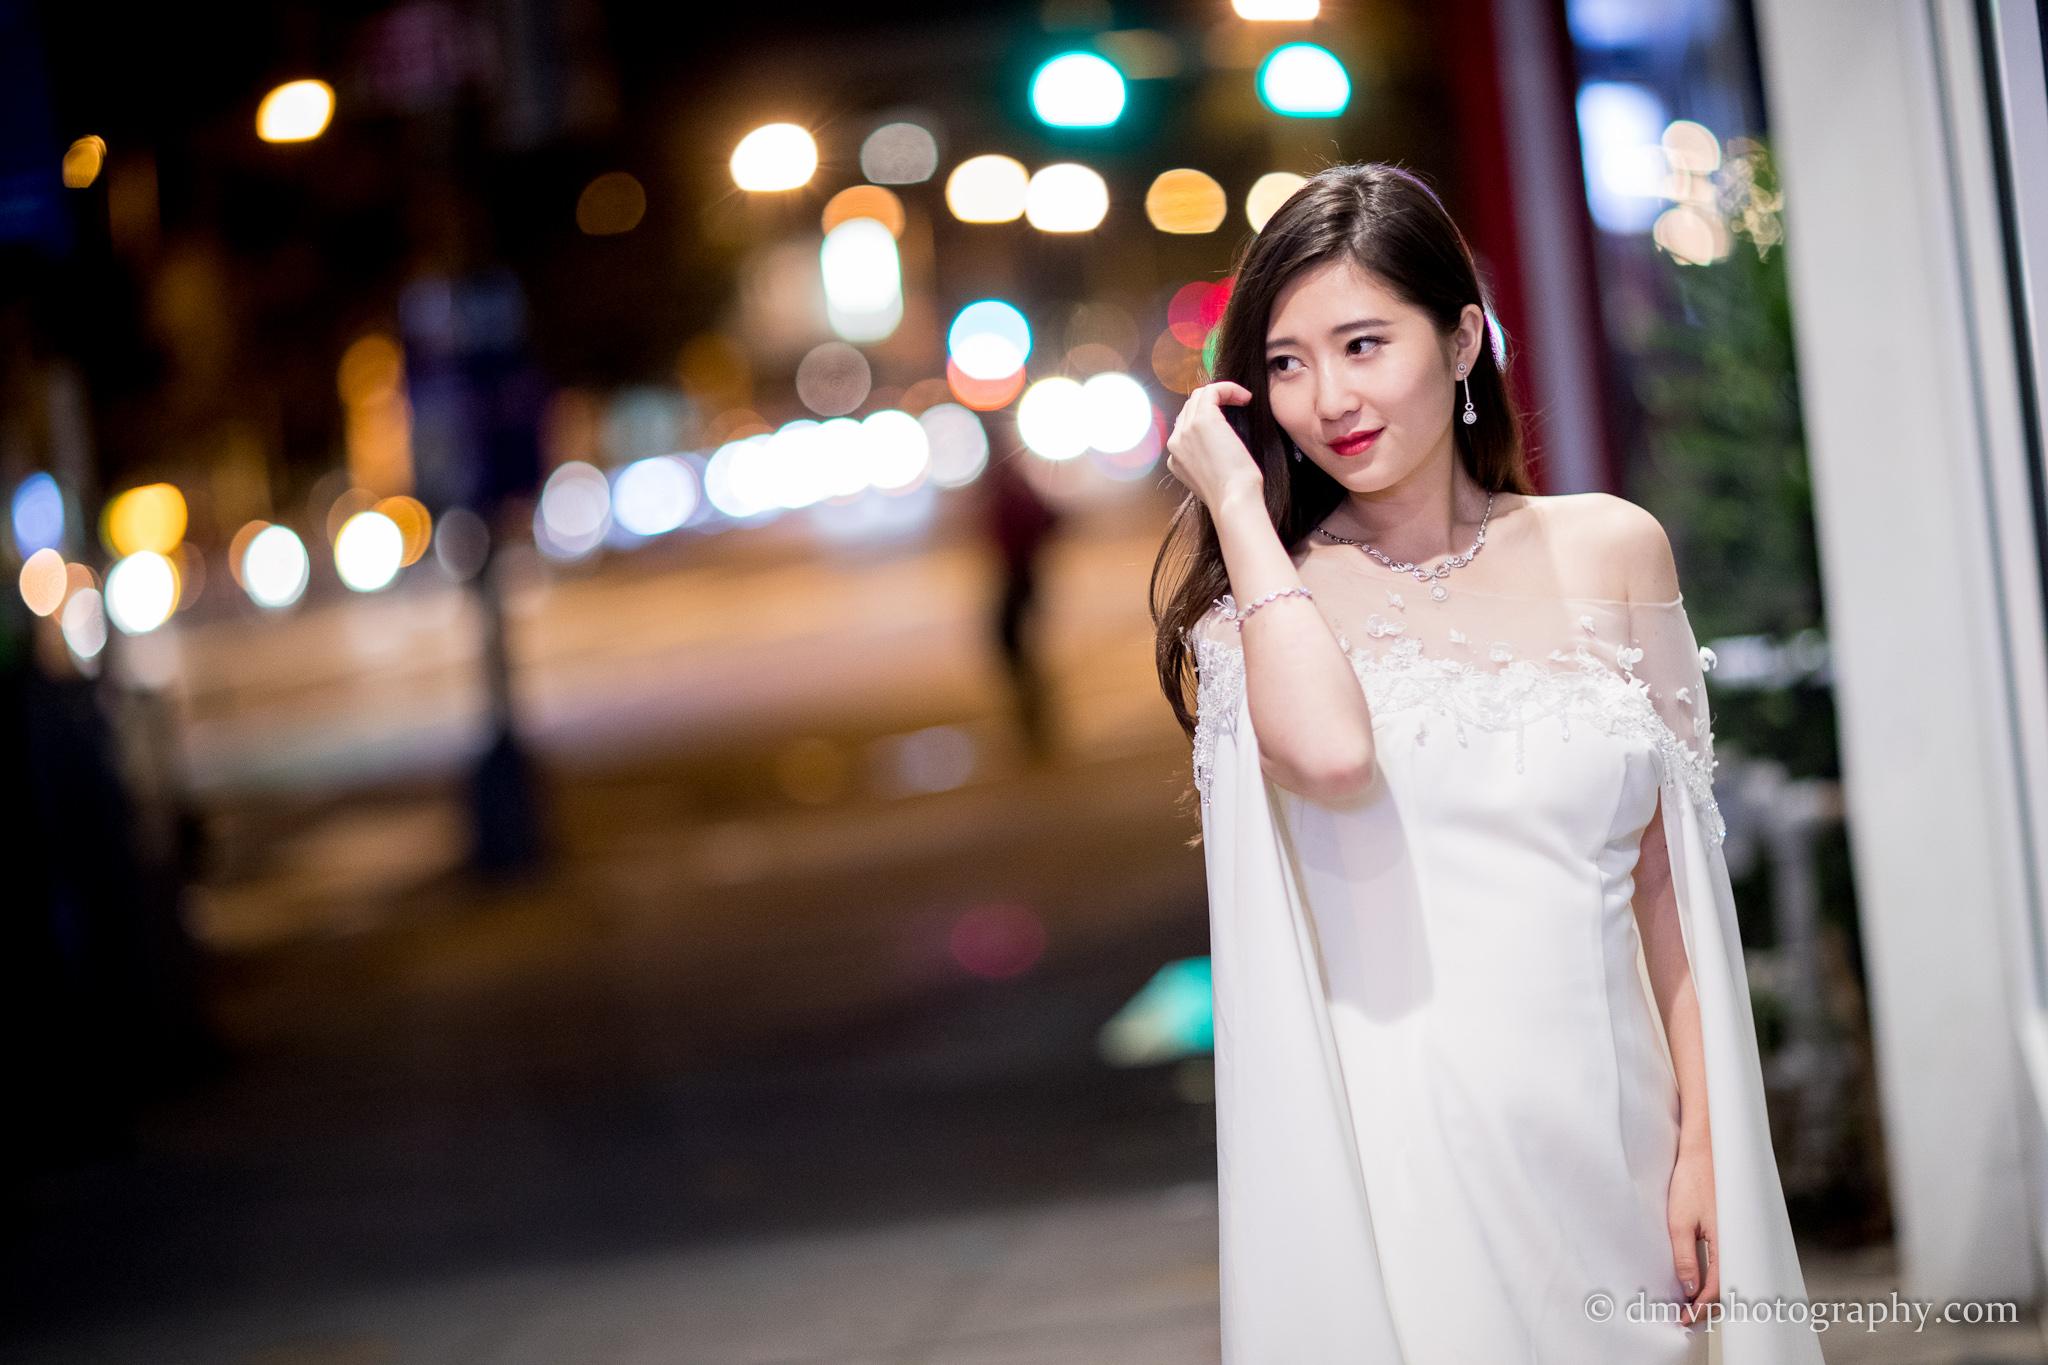 2016-10-15 - Story Chen - 00131